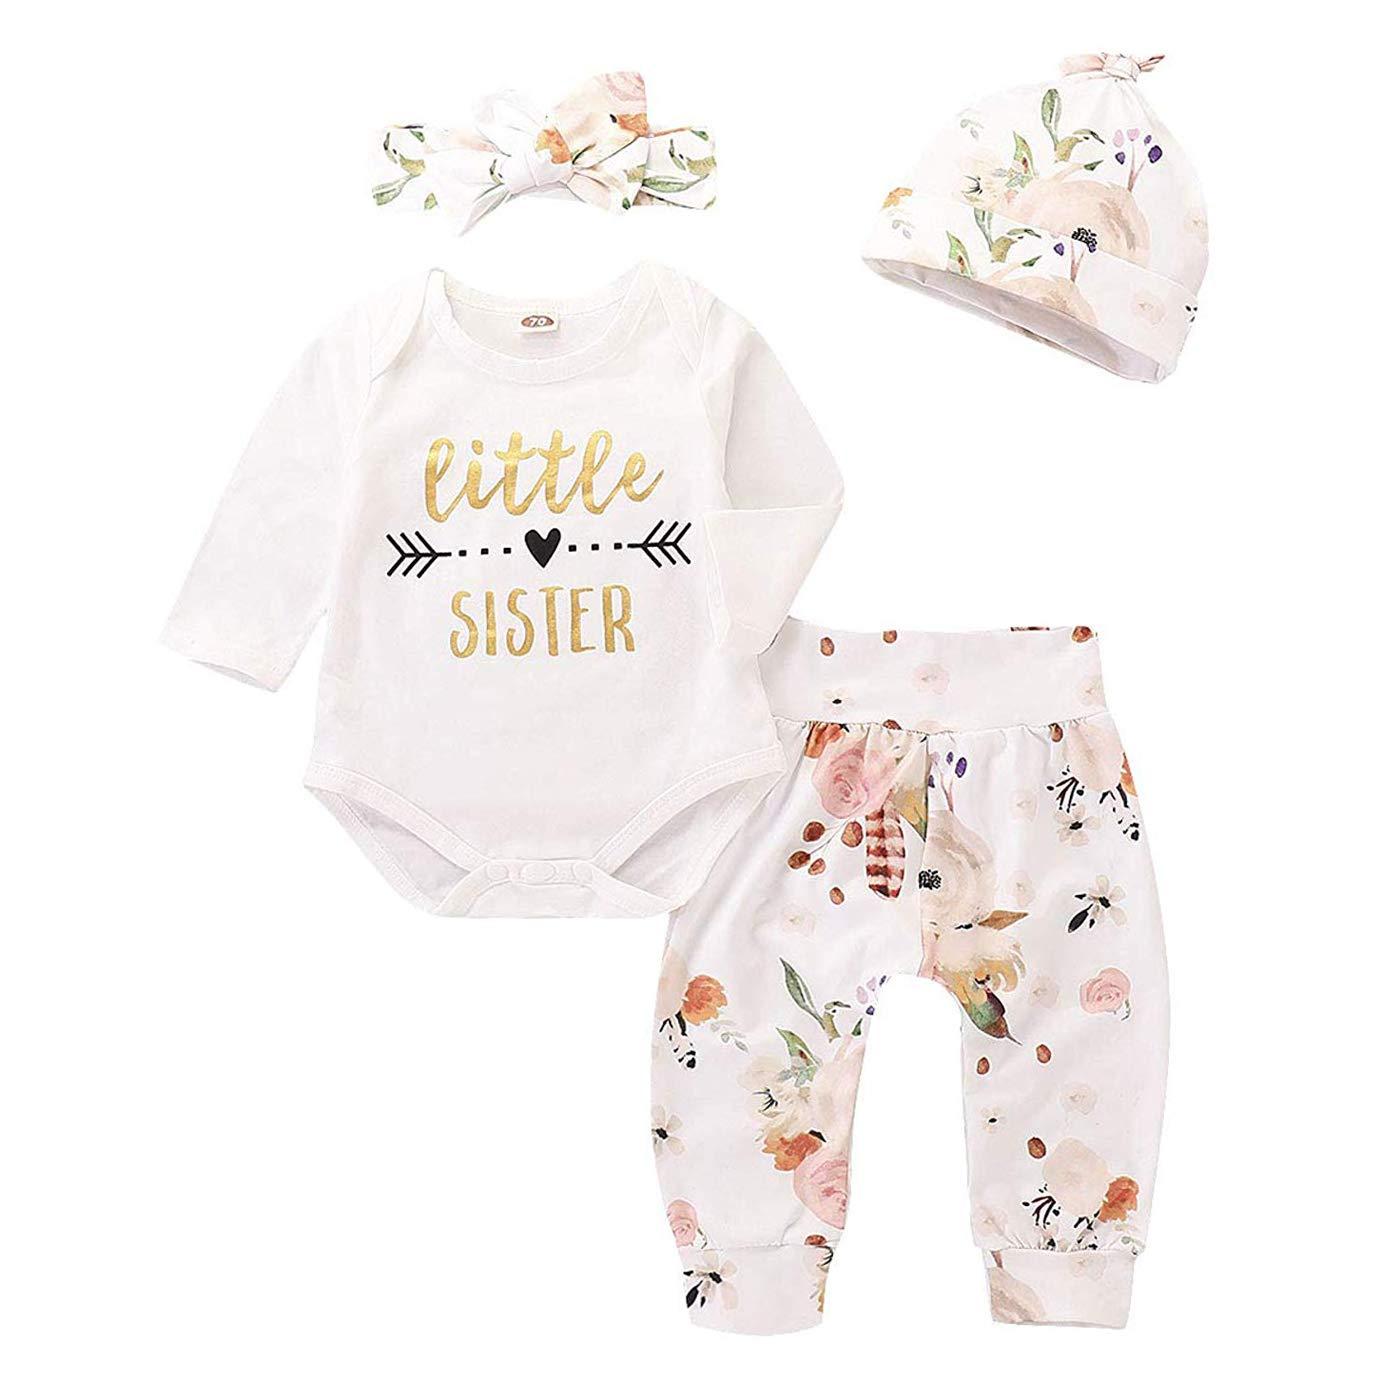 39822d9ba06 ❀❀ Design Litter sister printed romper + flower reindeer pants+floral  hat+bowknot headband ❀❀ Style Lovely cute style